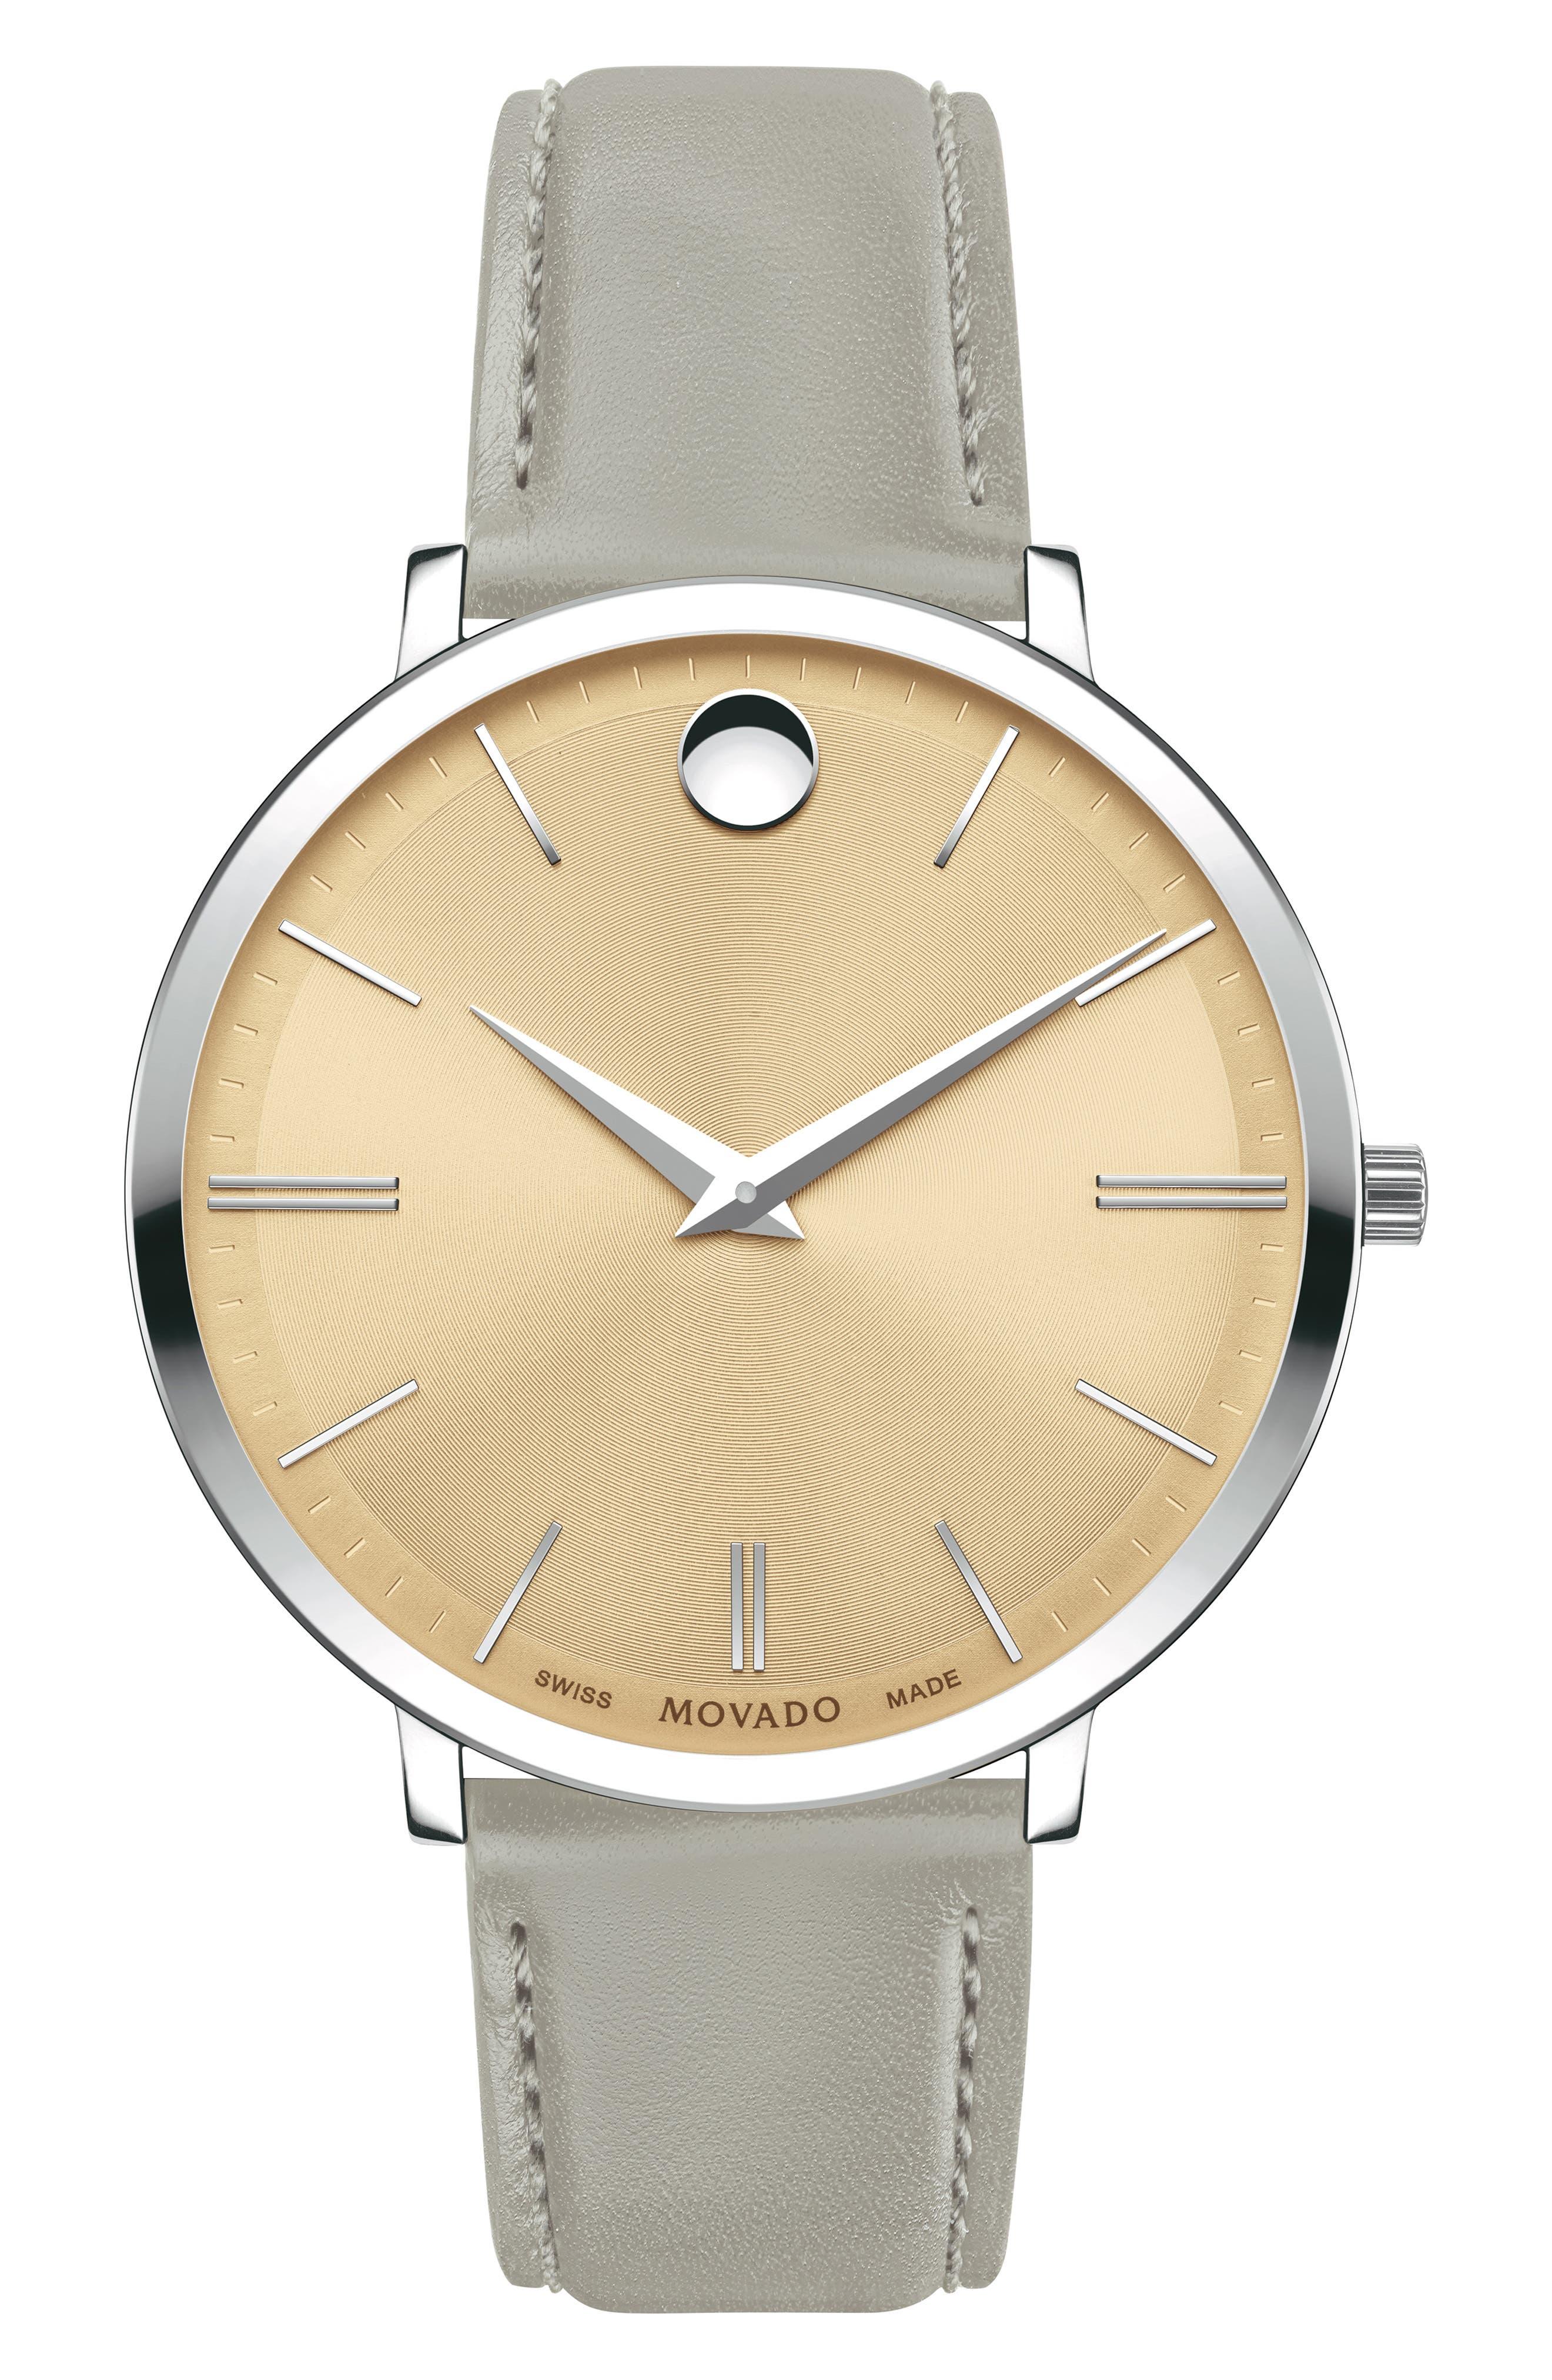 MOVADO Ultraslim Leather Strap Watch, 35mm, Main, color, GREY/ BEIGE/ SILVER